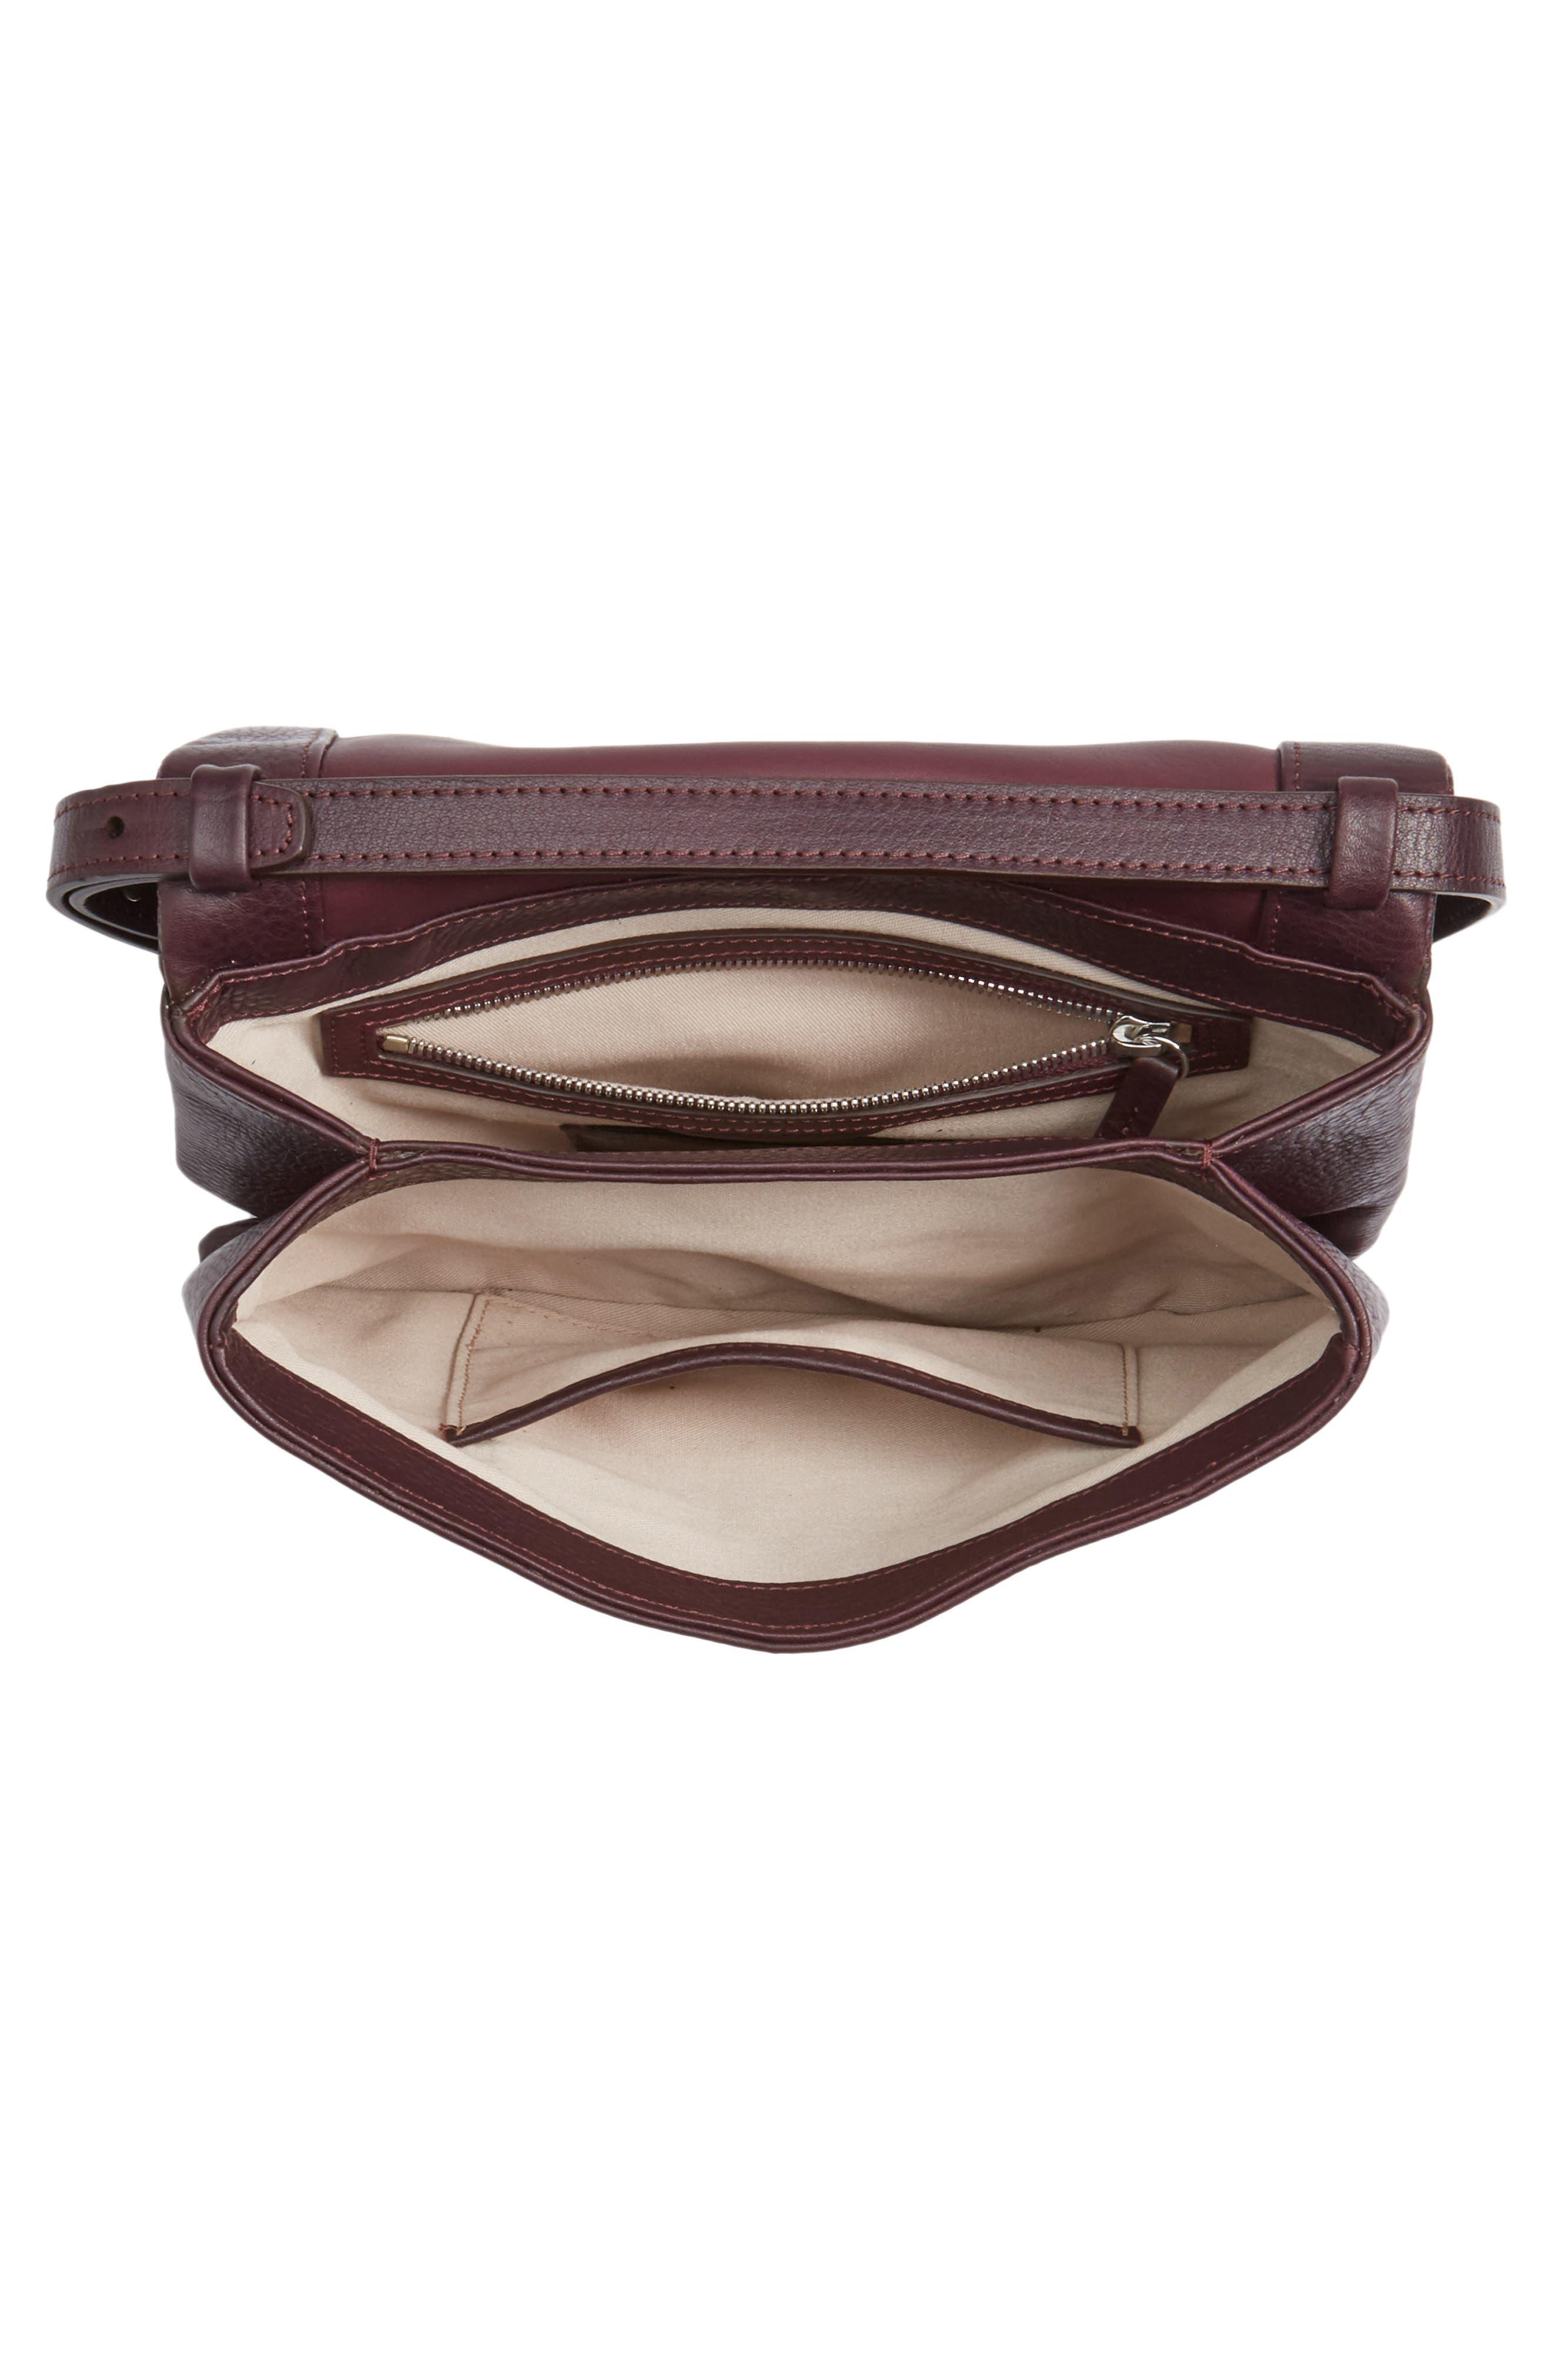 Alternate Image 3  - Shinola Leather Convertible Shoulder Bag